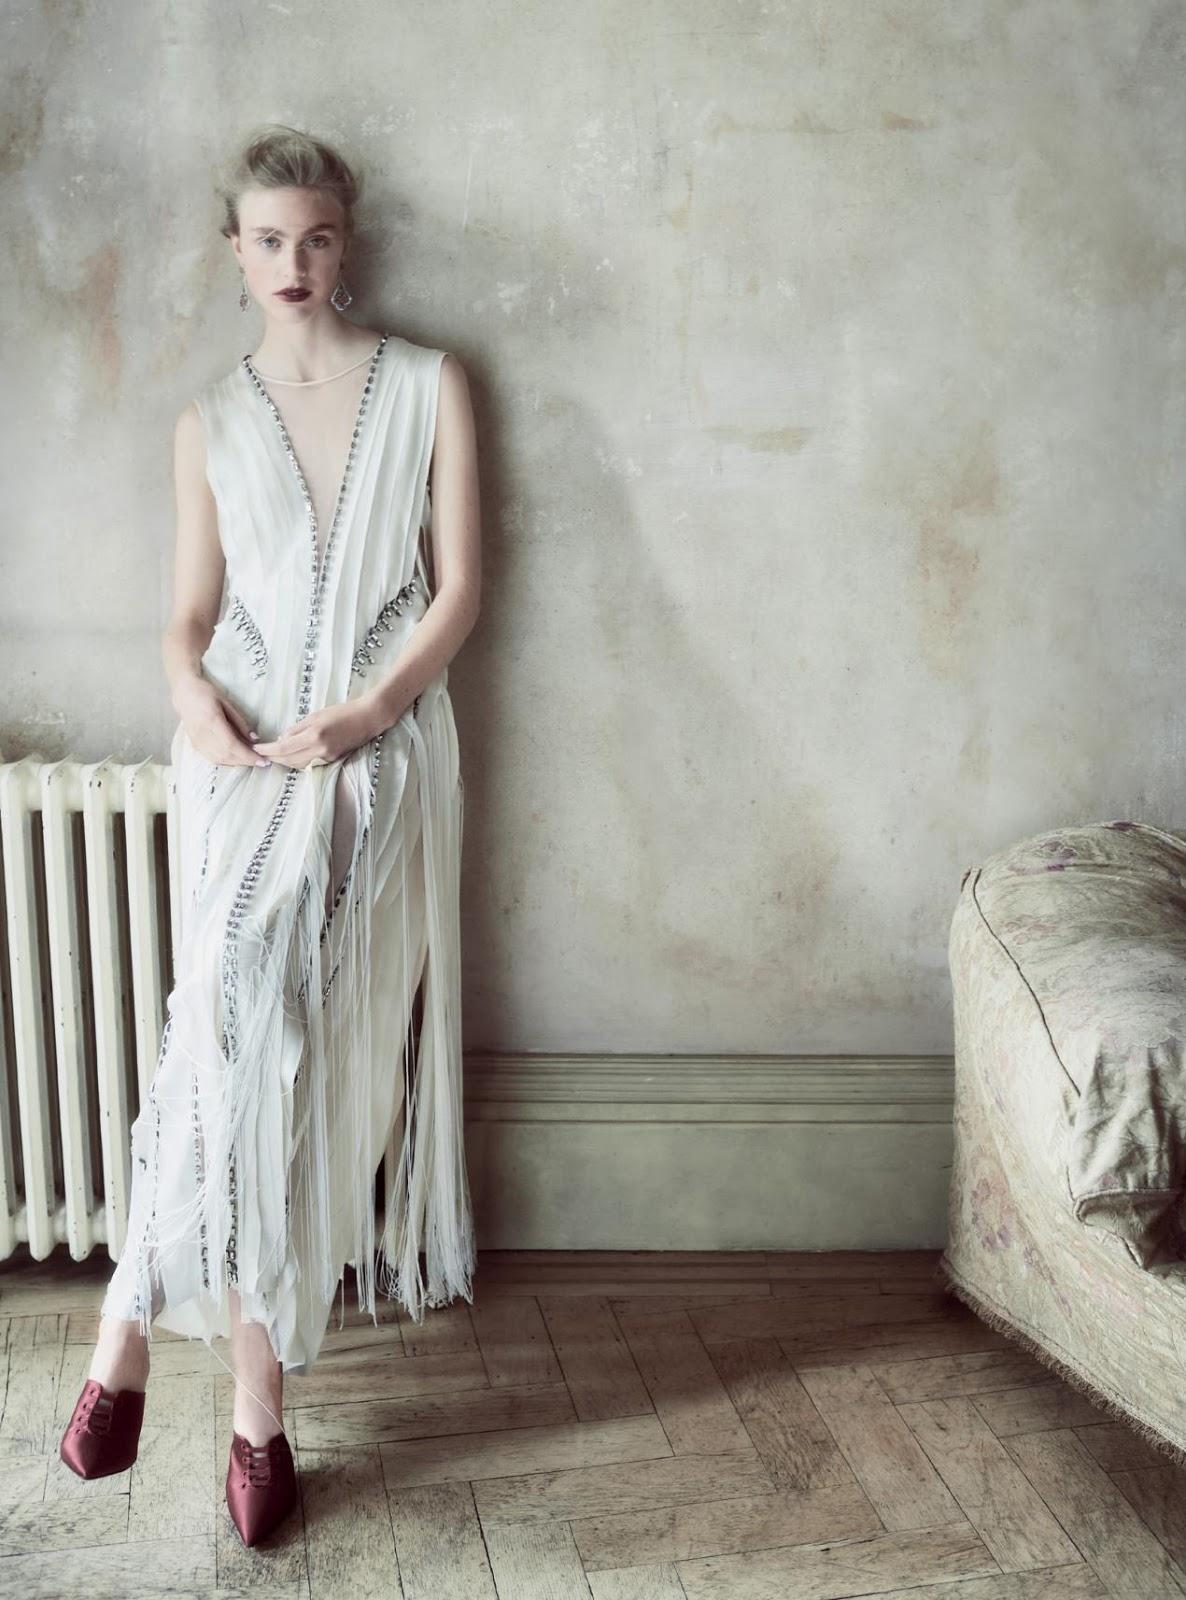 платье из шелка и шифона, Alberta Ferretti Couture Collection; туфли из сатина, Alberta Ferretti; серьги из белого золота с сапфирами, рубинами, цаворитами, аметистами и бриллиантами, Chopard